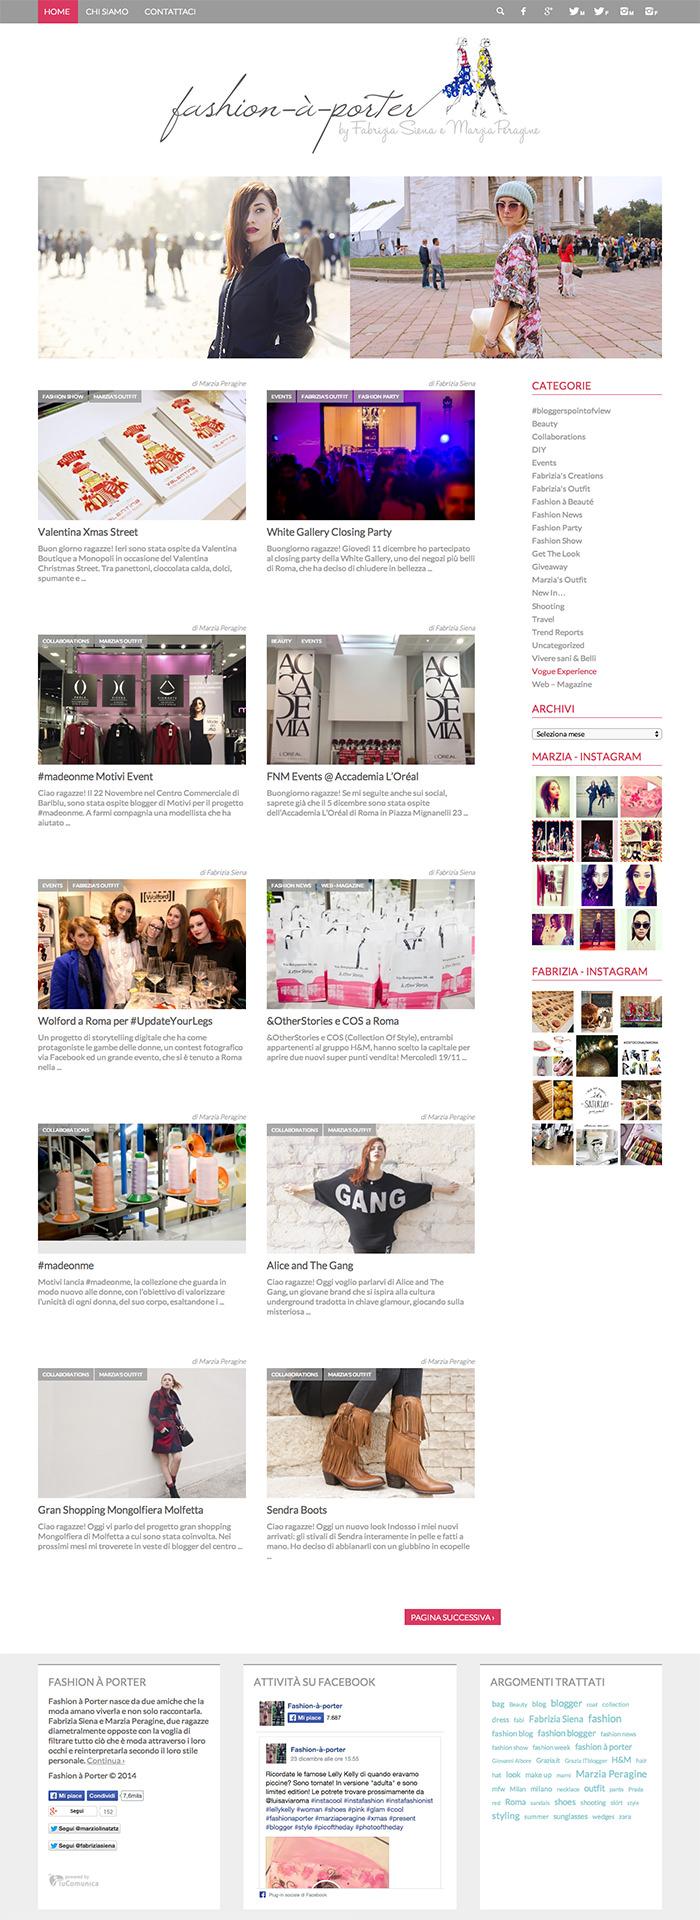 fashion-blog-sviluppo-sito-web-responsive-2